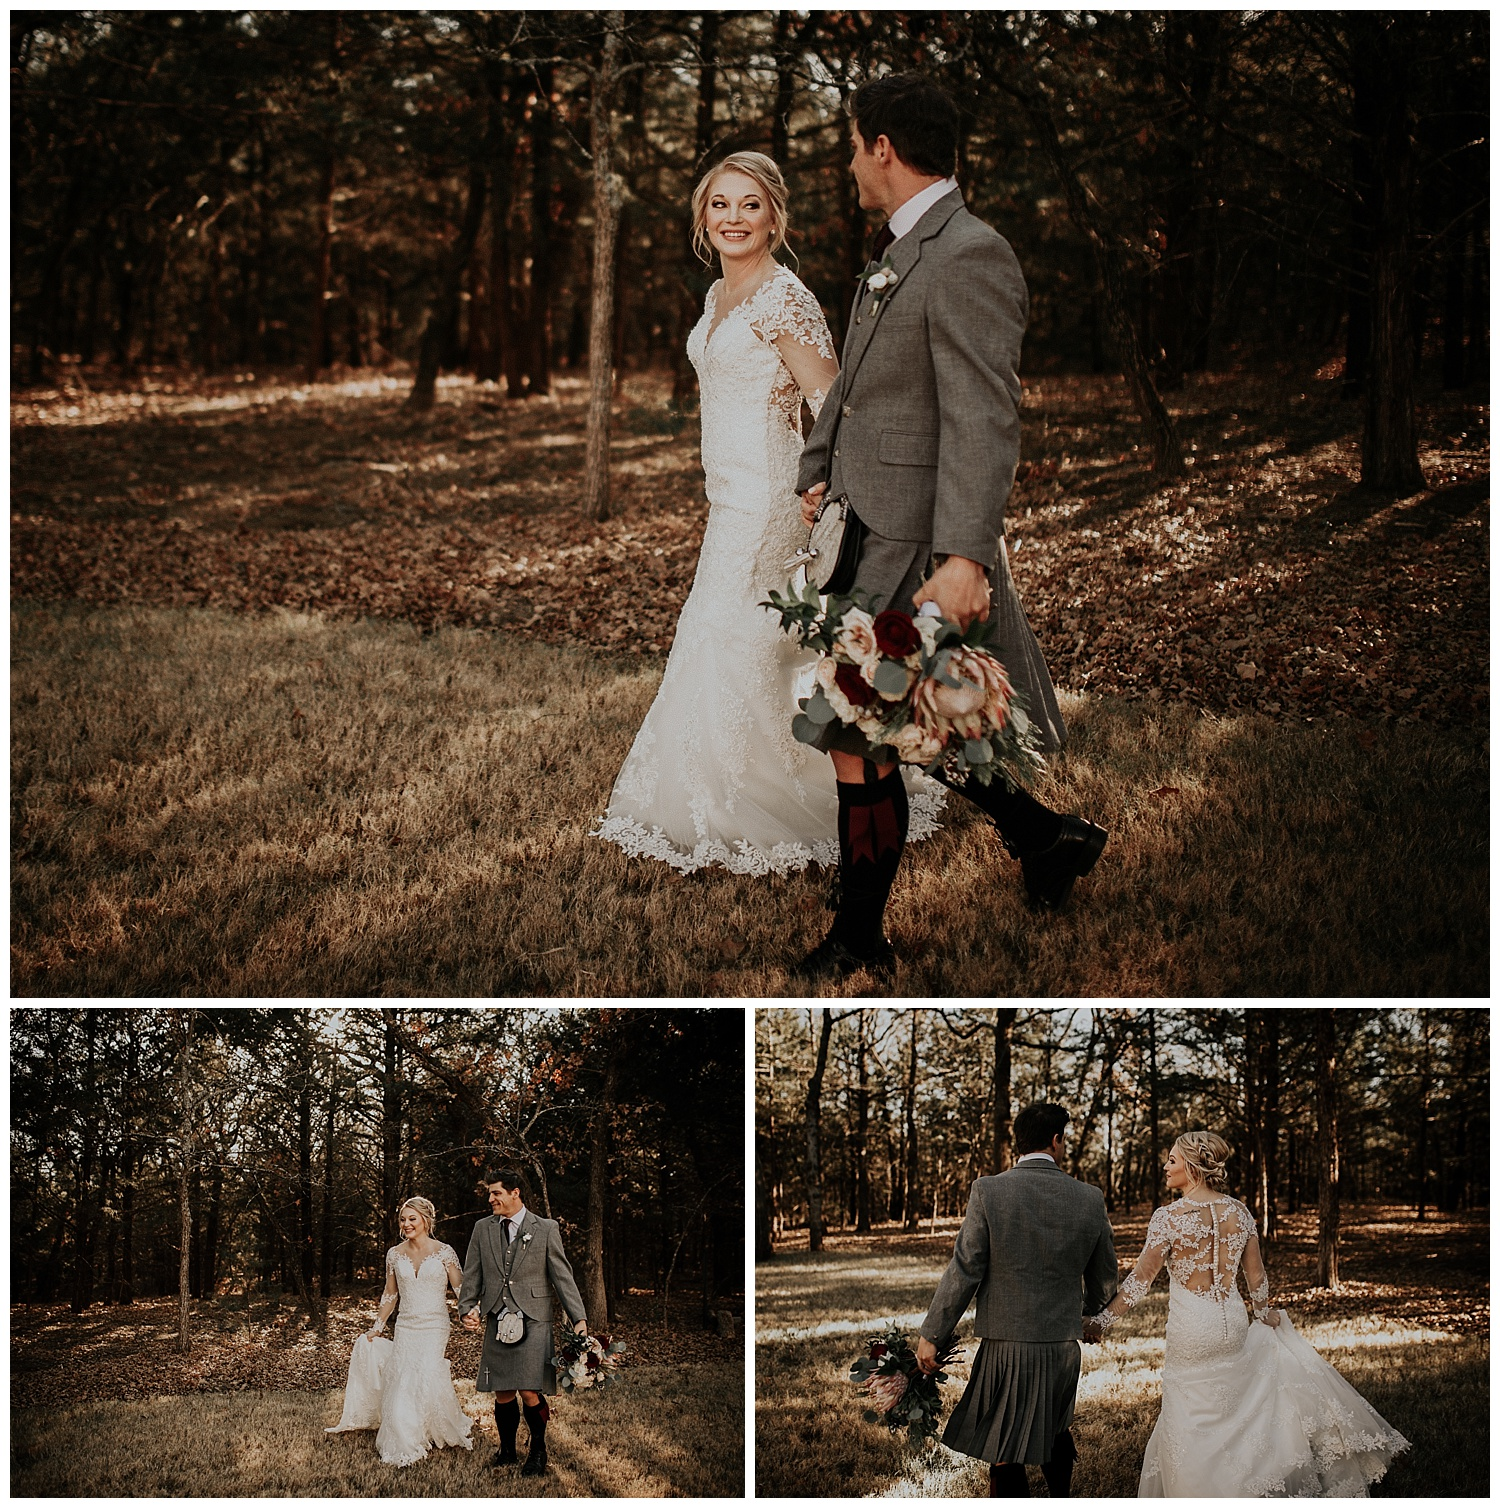 Laken-Mackenzie-Photography-Palm-Whispering-Oaks-Wedding-Venue-Dallas-Wedding-Photographer19.jpg